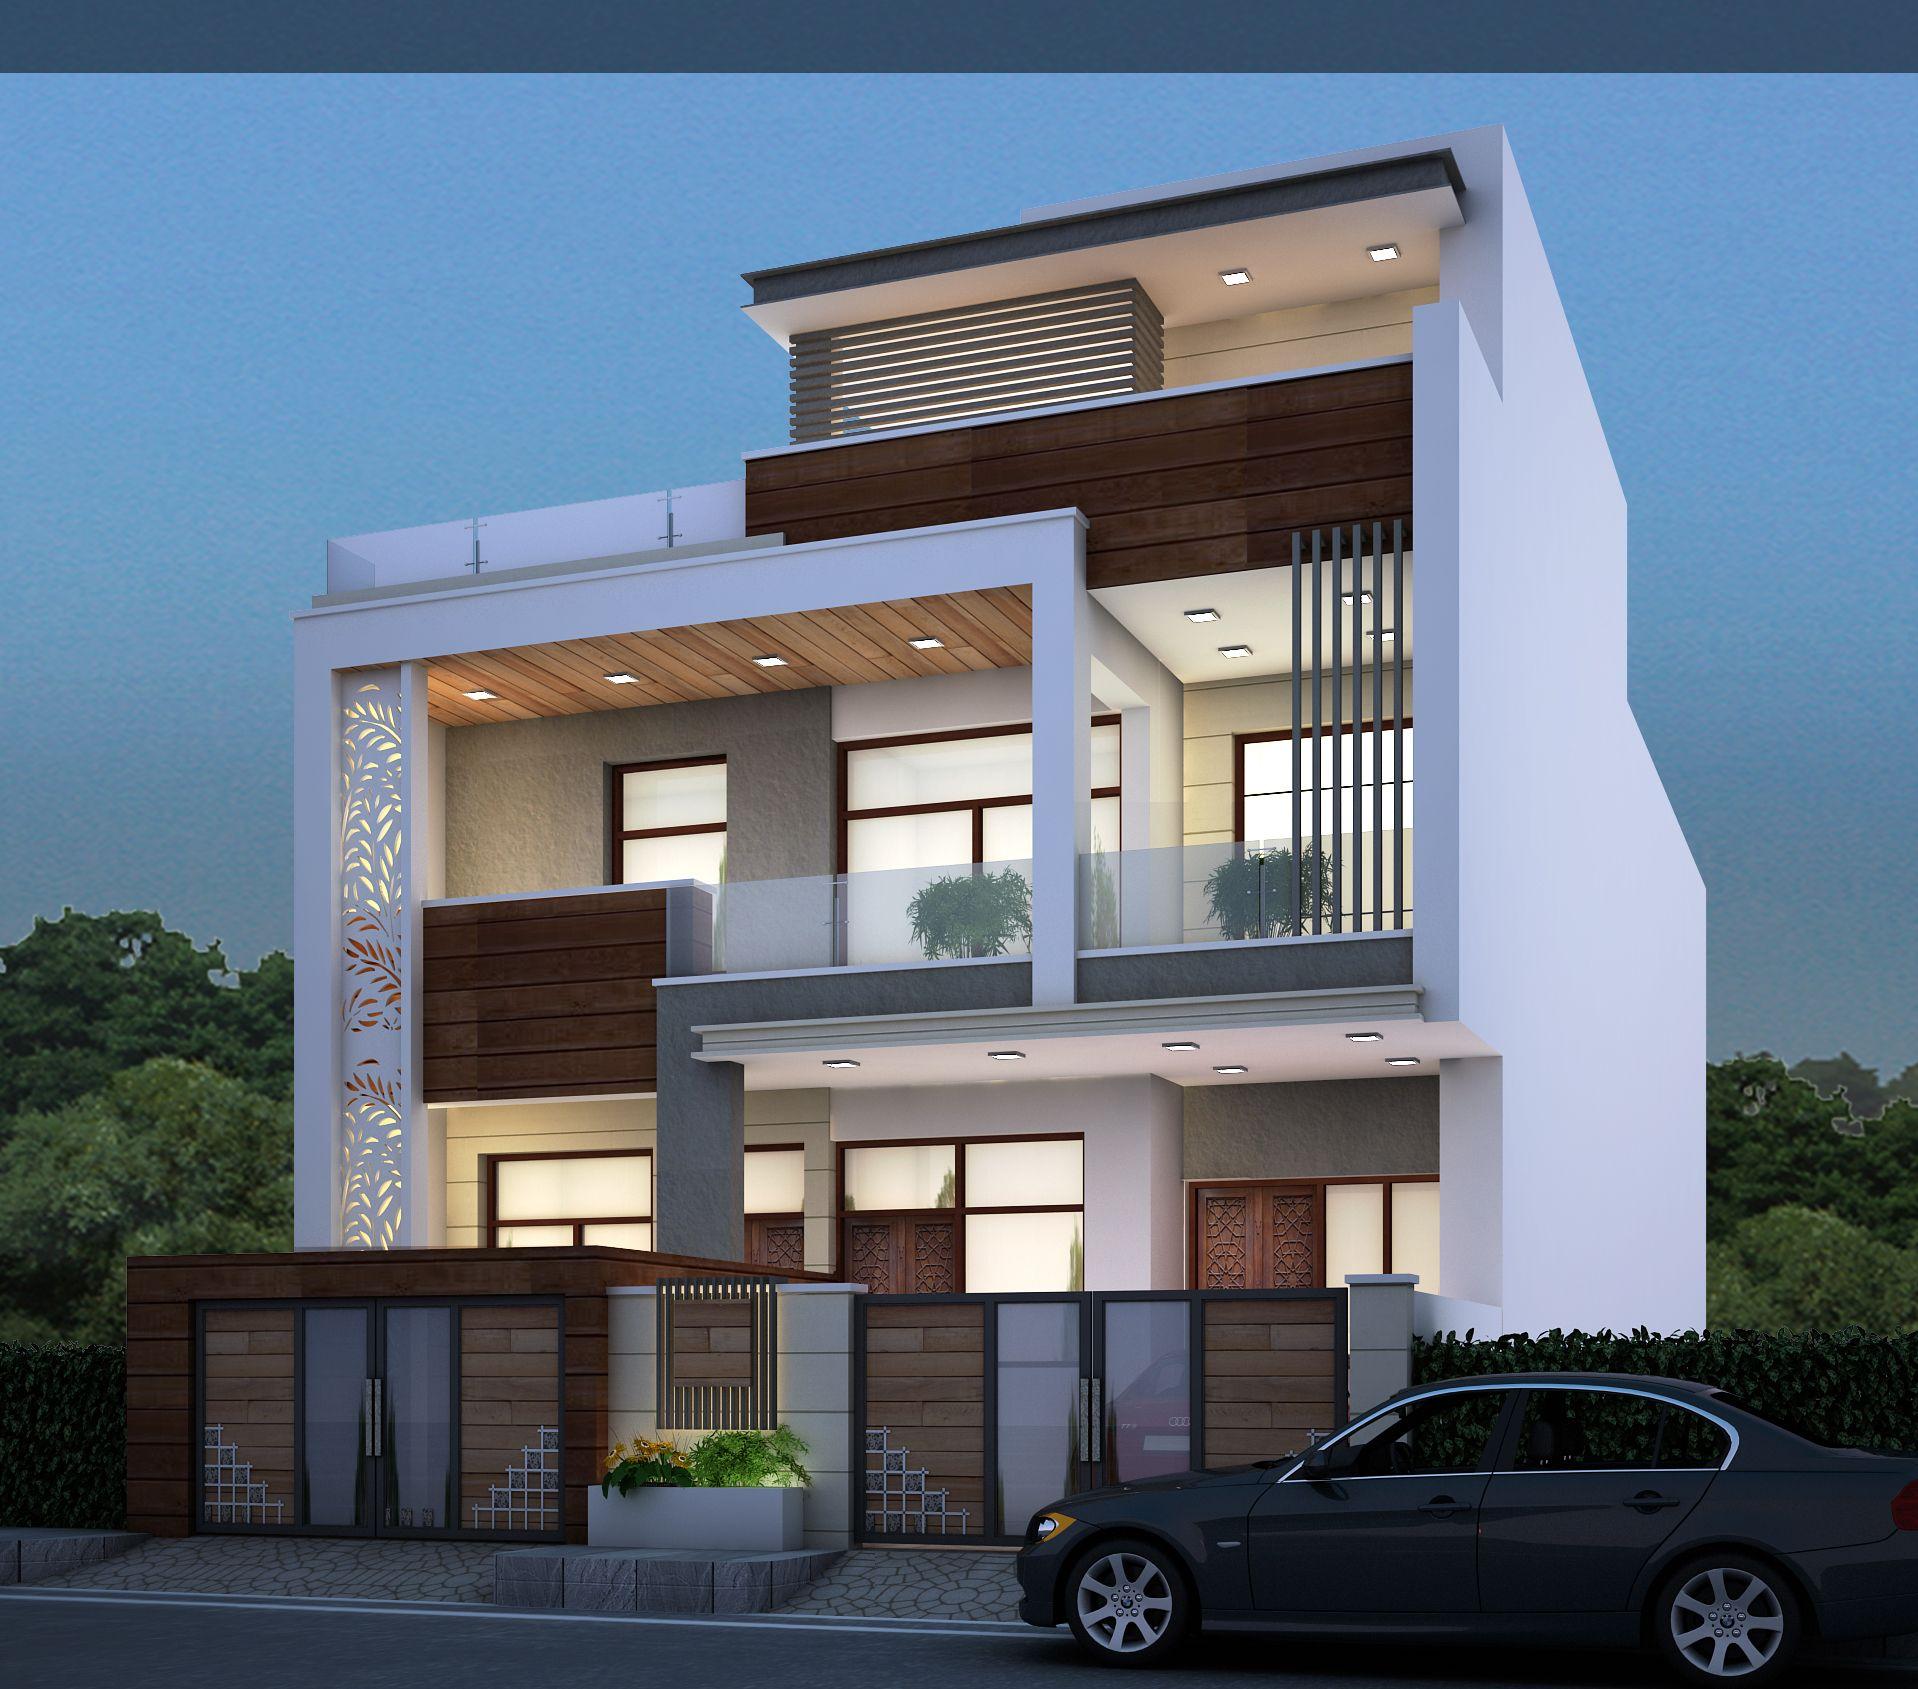 Chitrakoot Scheme Jaipur With Images Facade House Duplex House Design House Designs Exterior